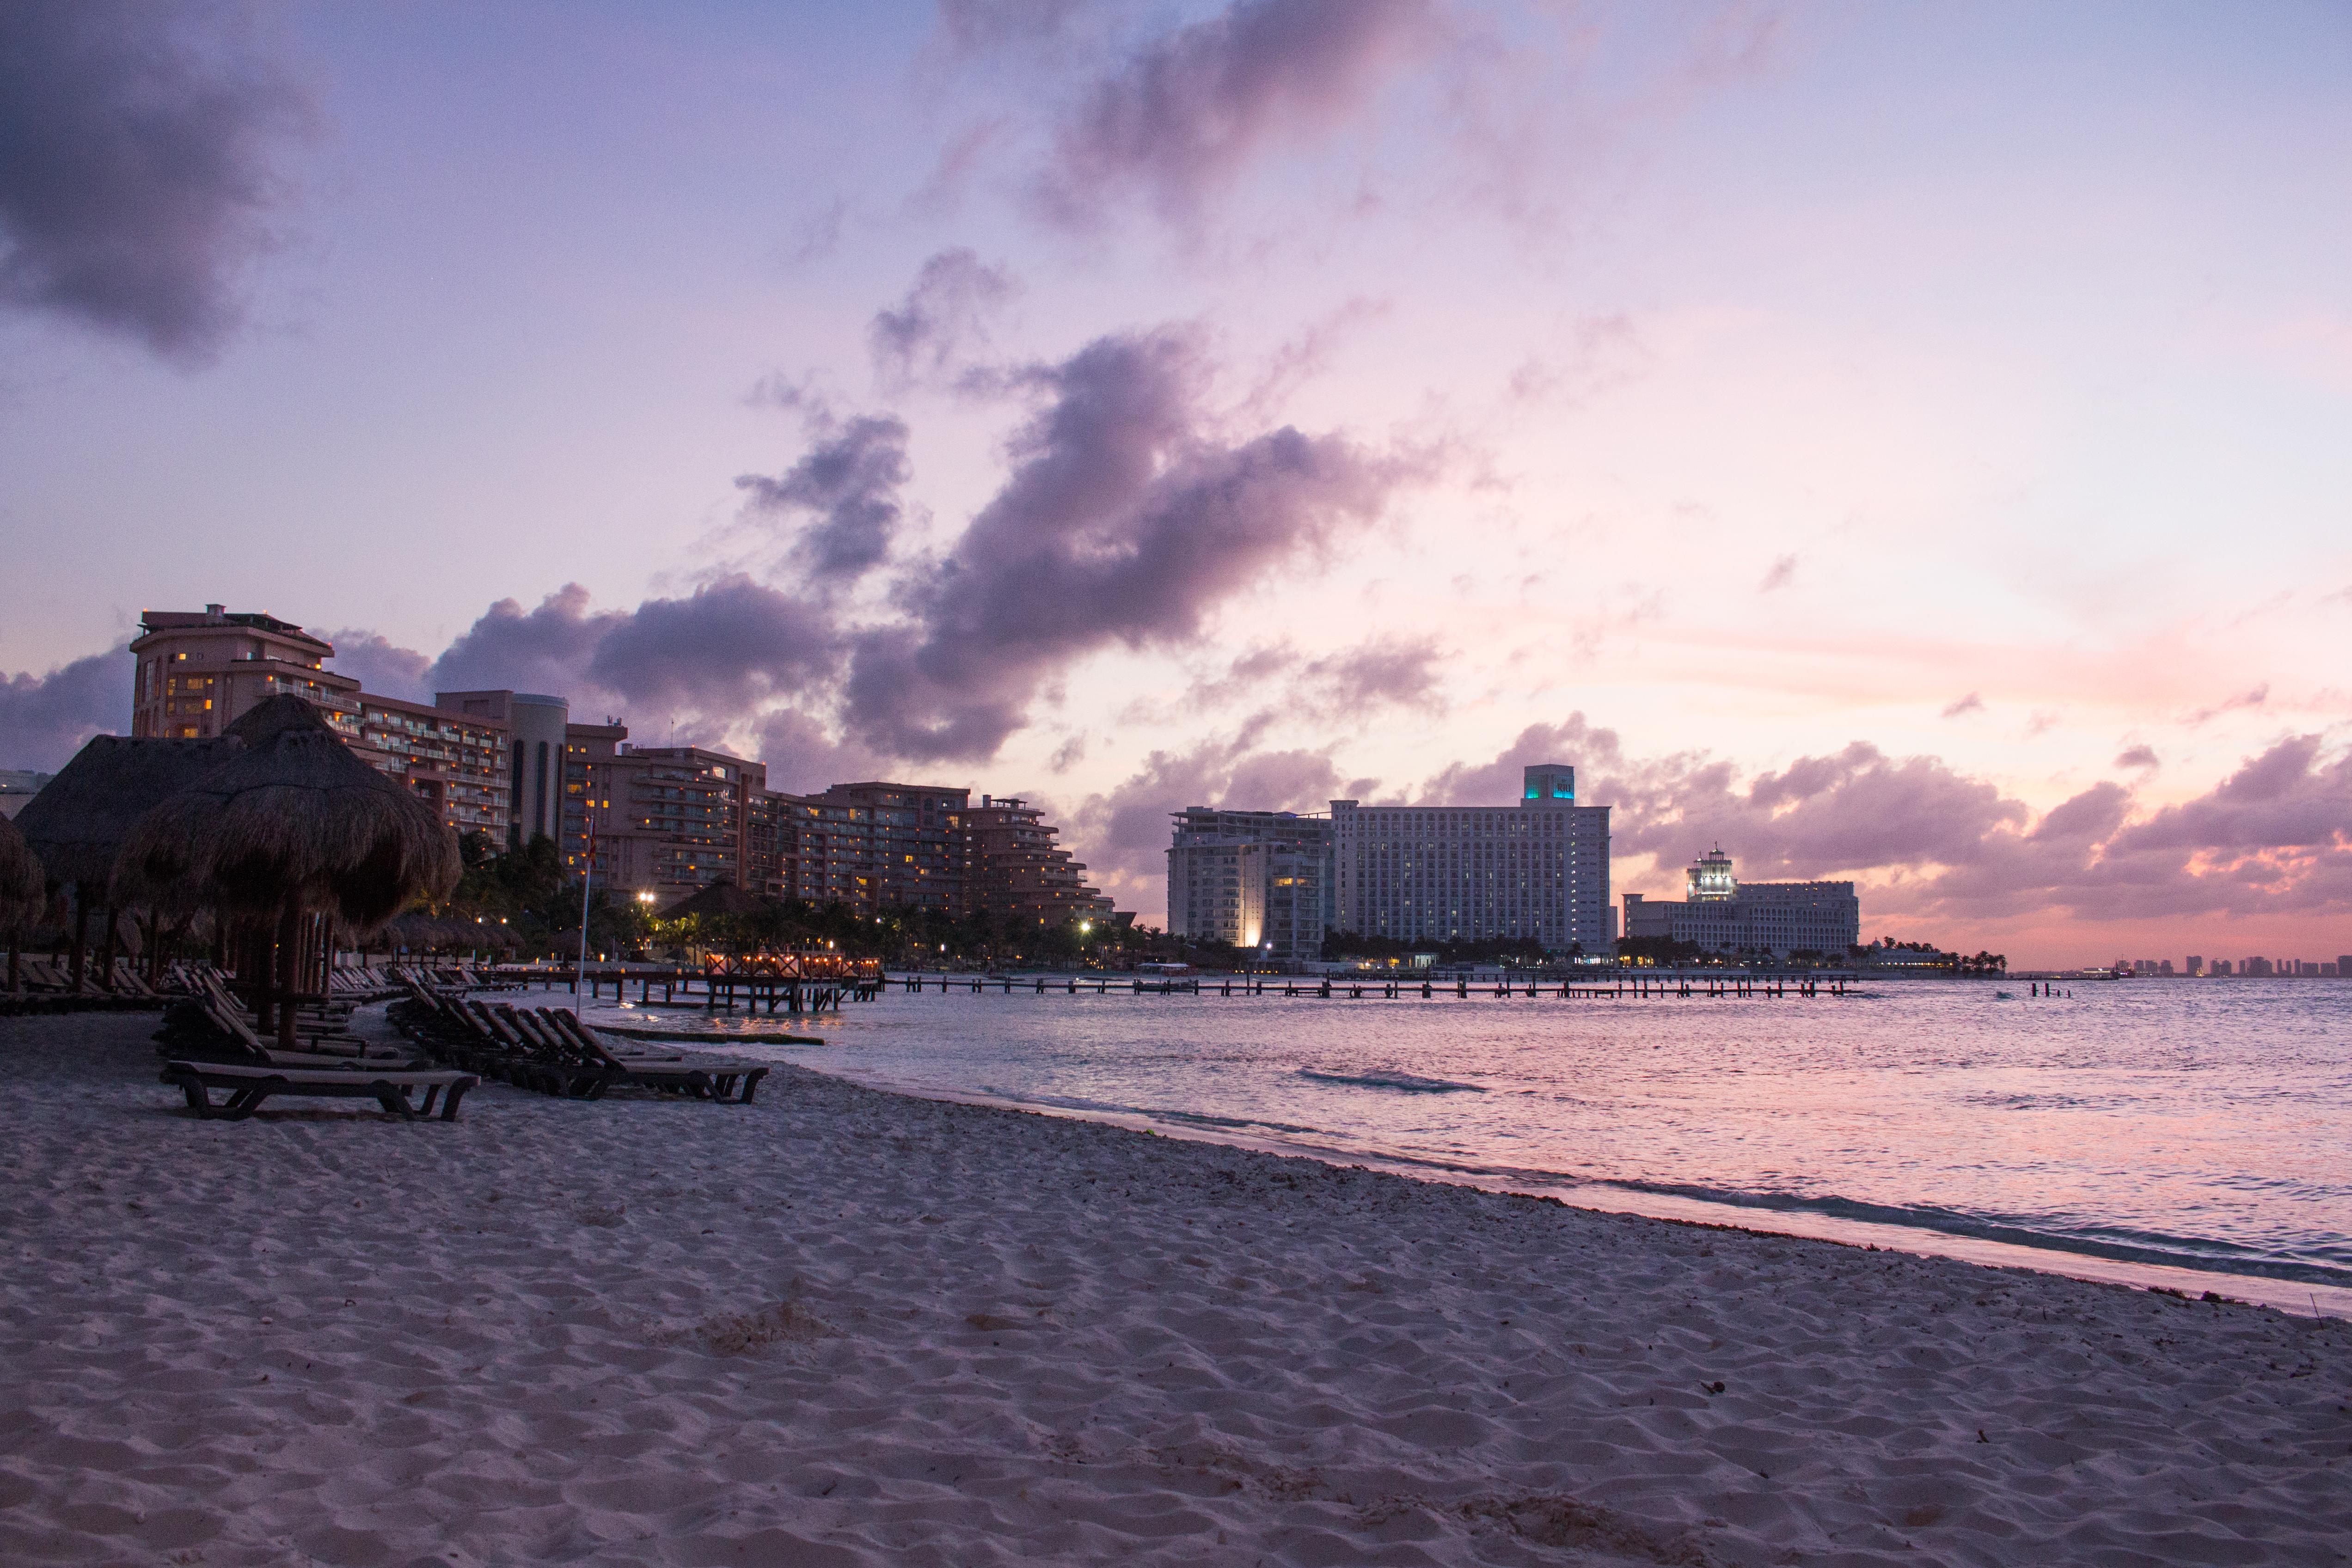 Resorts at sunset